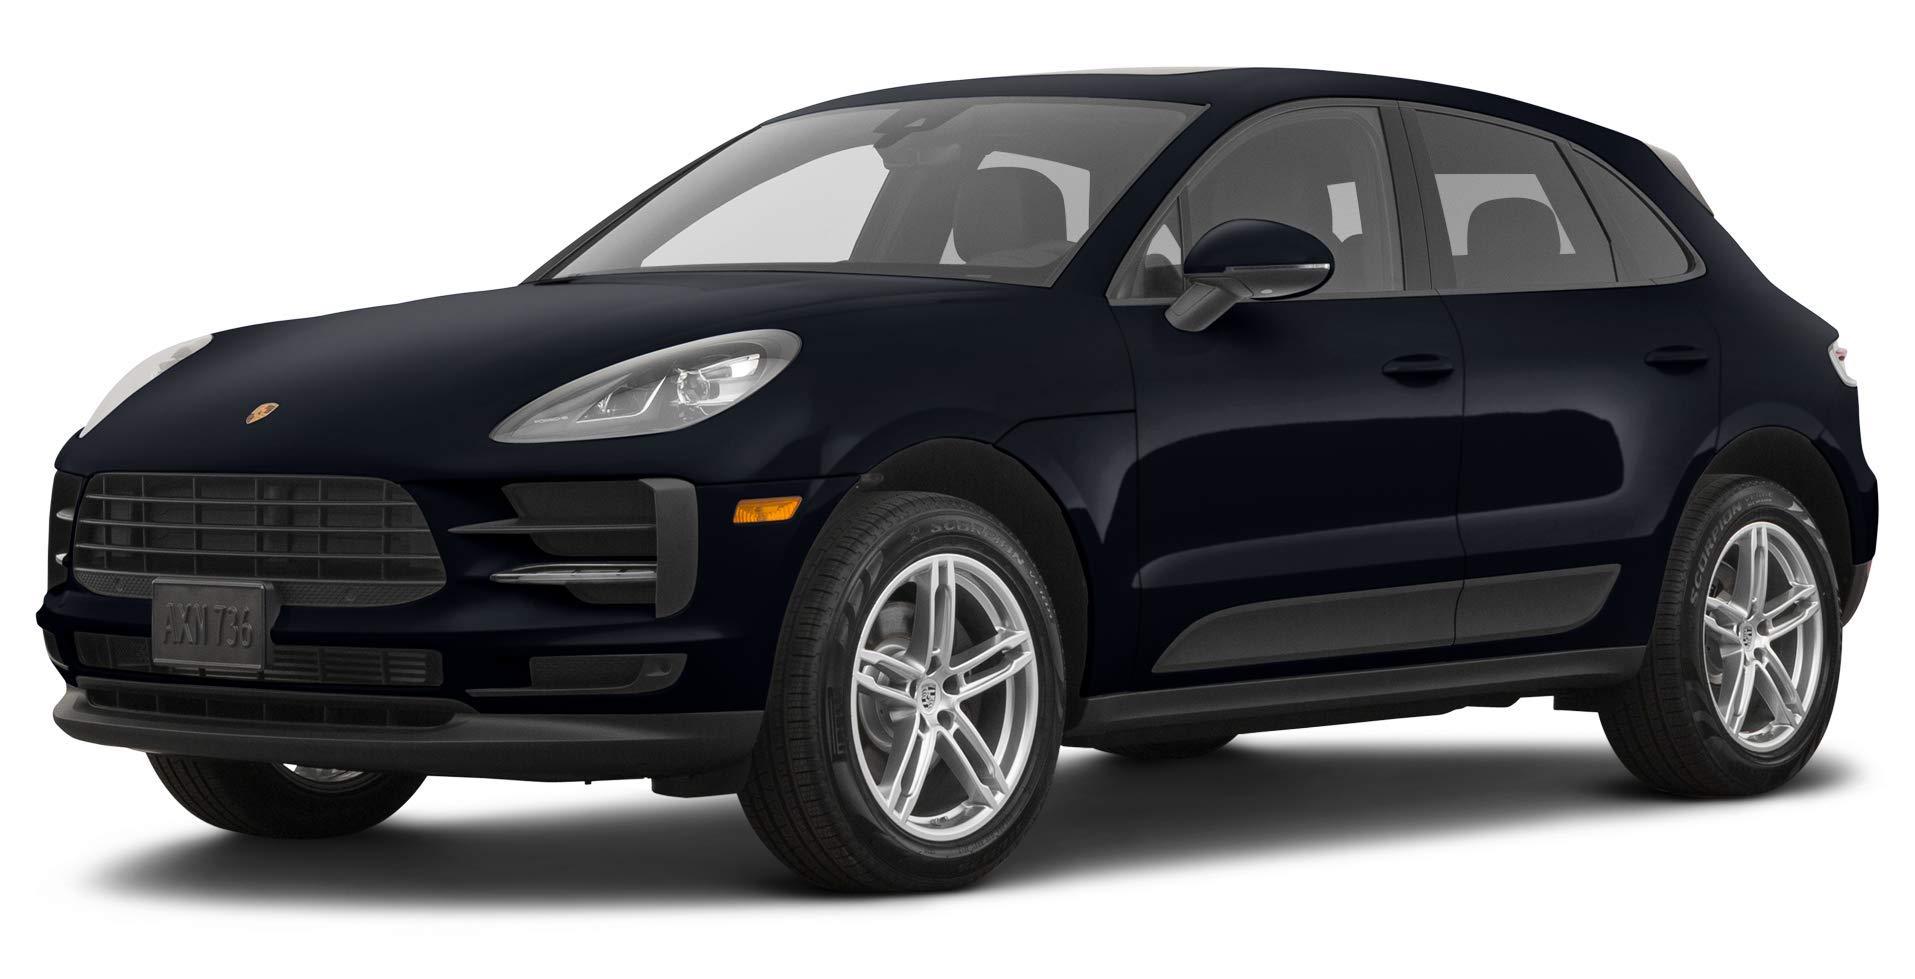 Amazon Com 2019 Porsche Macan Reviews Images And Specs Vehicles